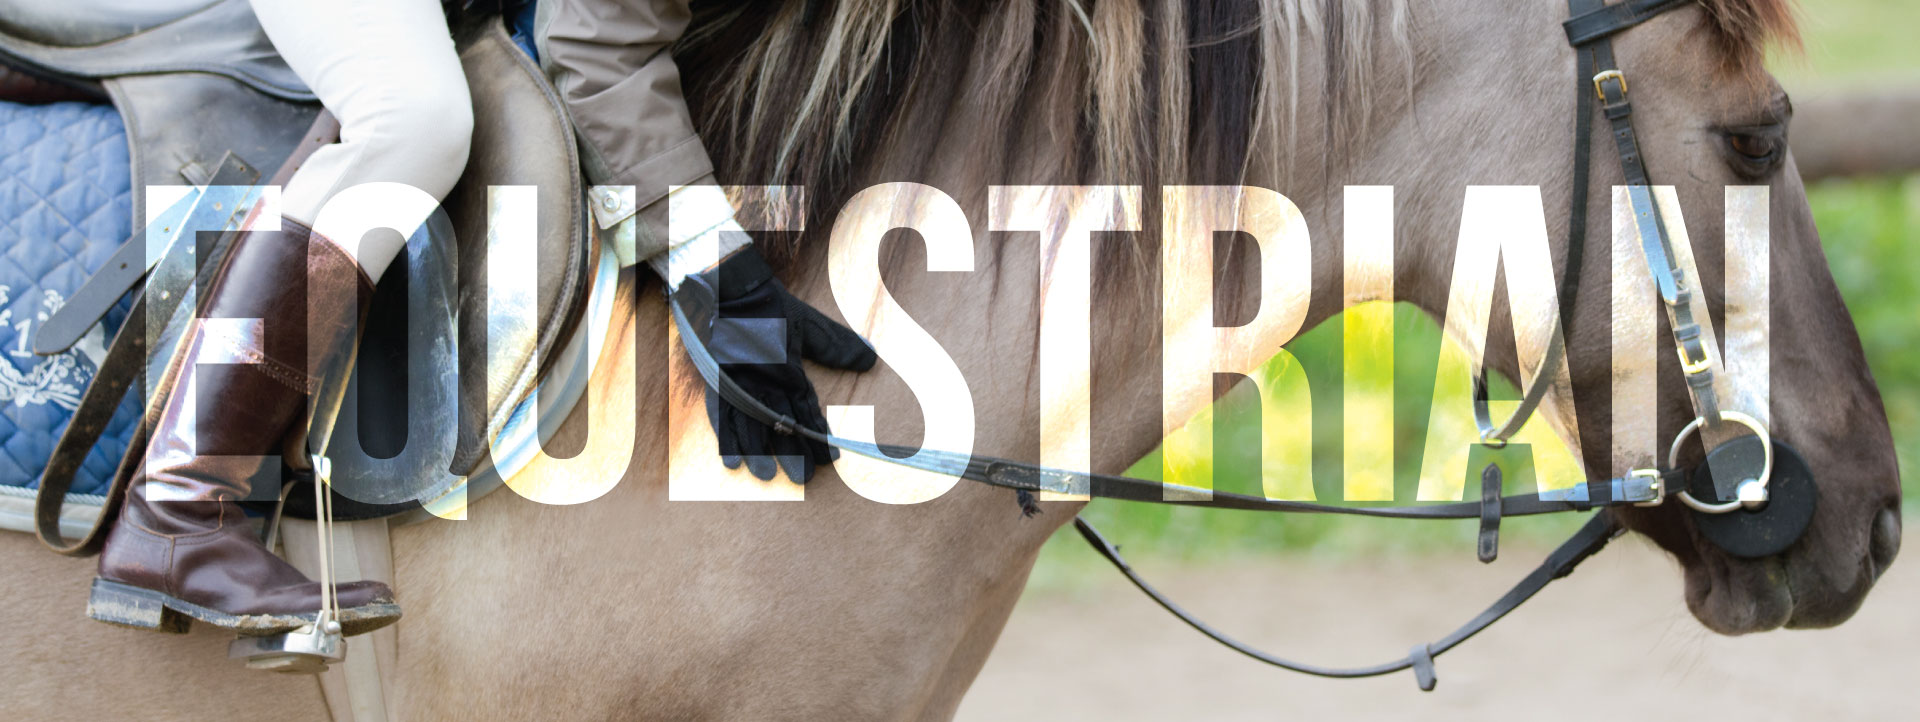 Equestrian Program